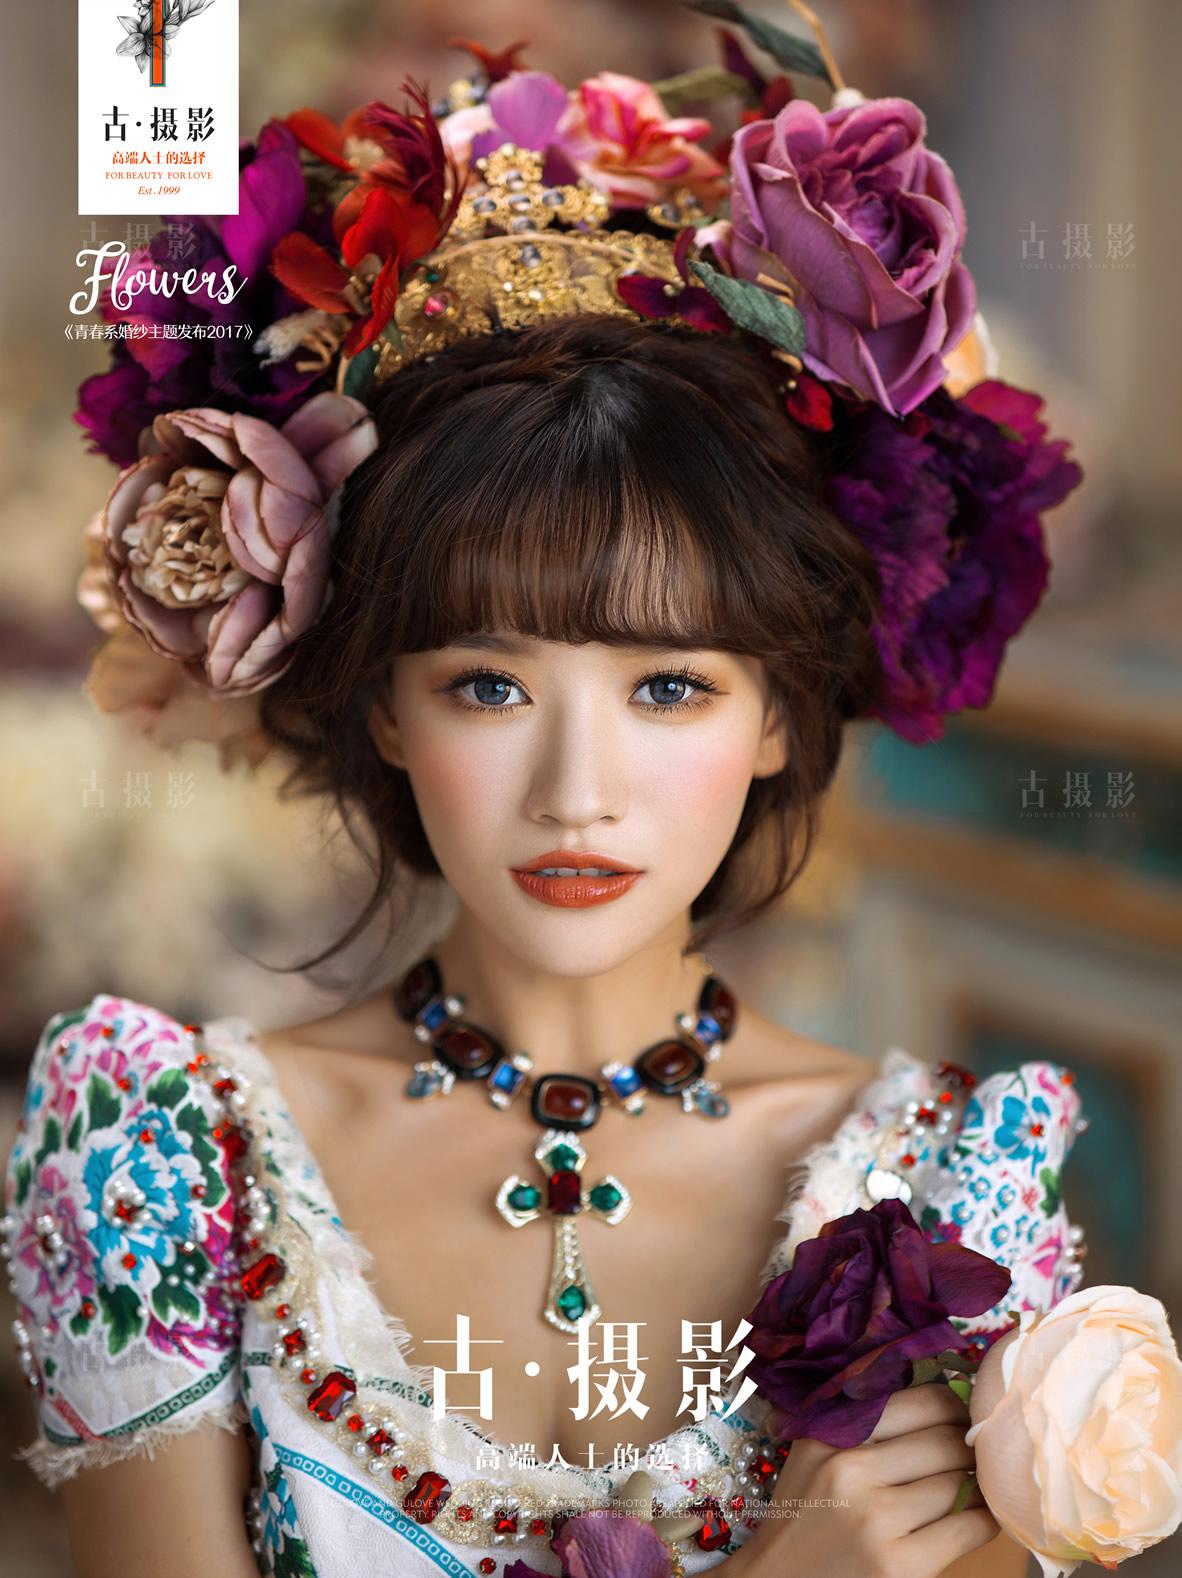 flowers - 明星范 - 古摄影婚纱艺术-古摄影成都婚纱摄影艺术摄影网